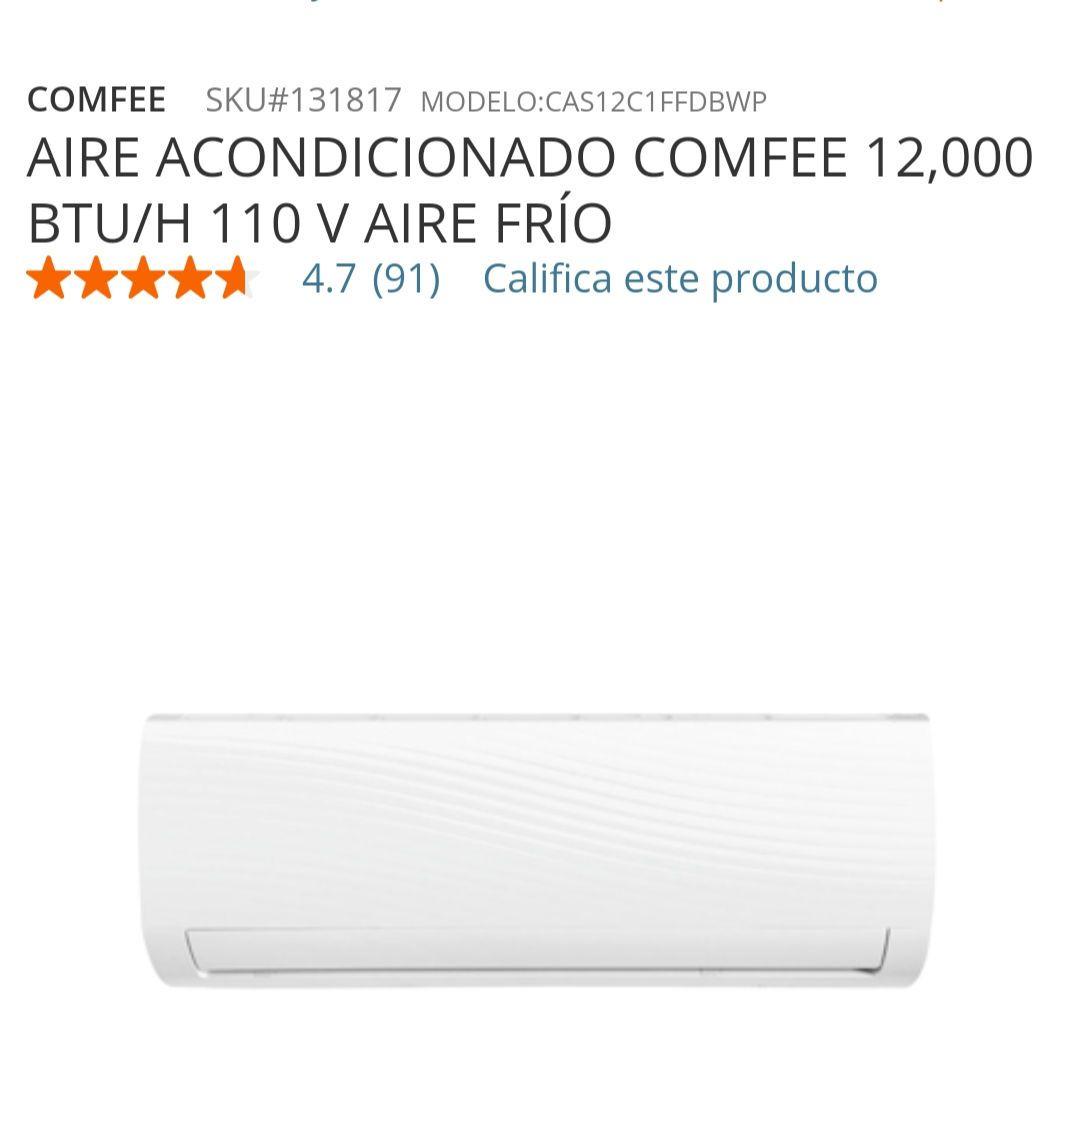 Home Depot: MINISPLIT COMFEE - SOLO FRIO 110V